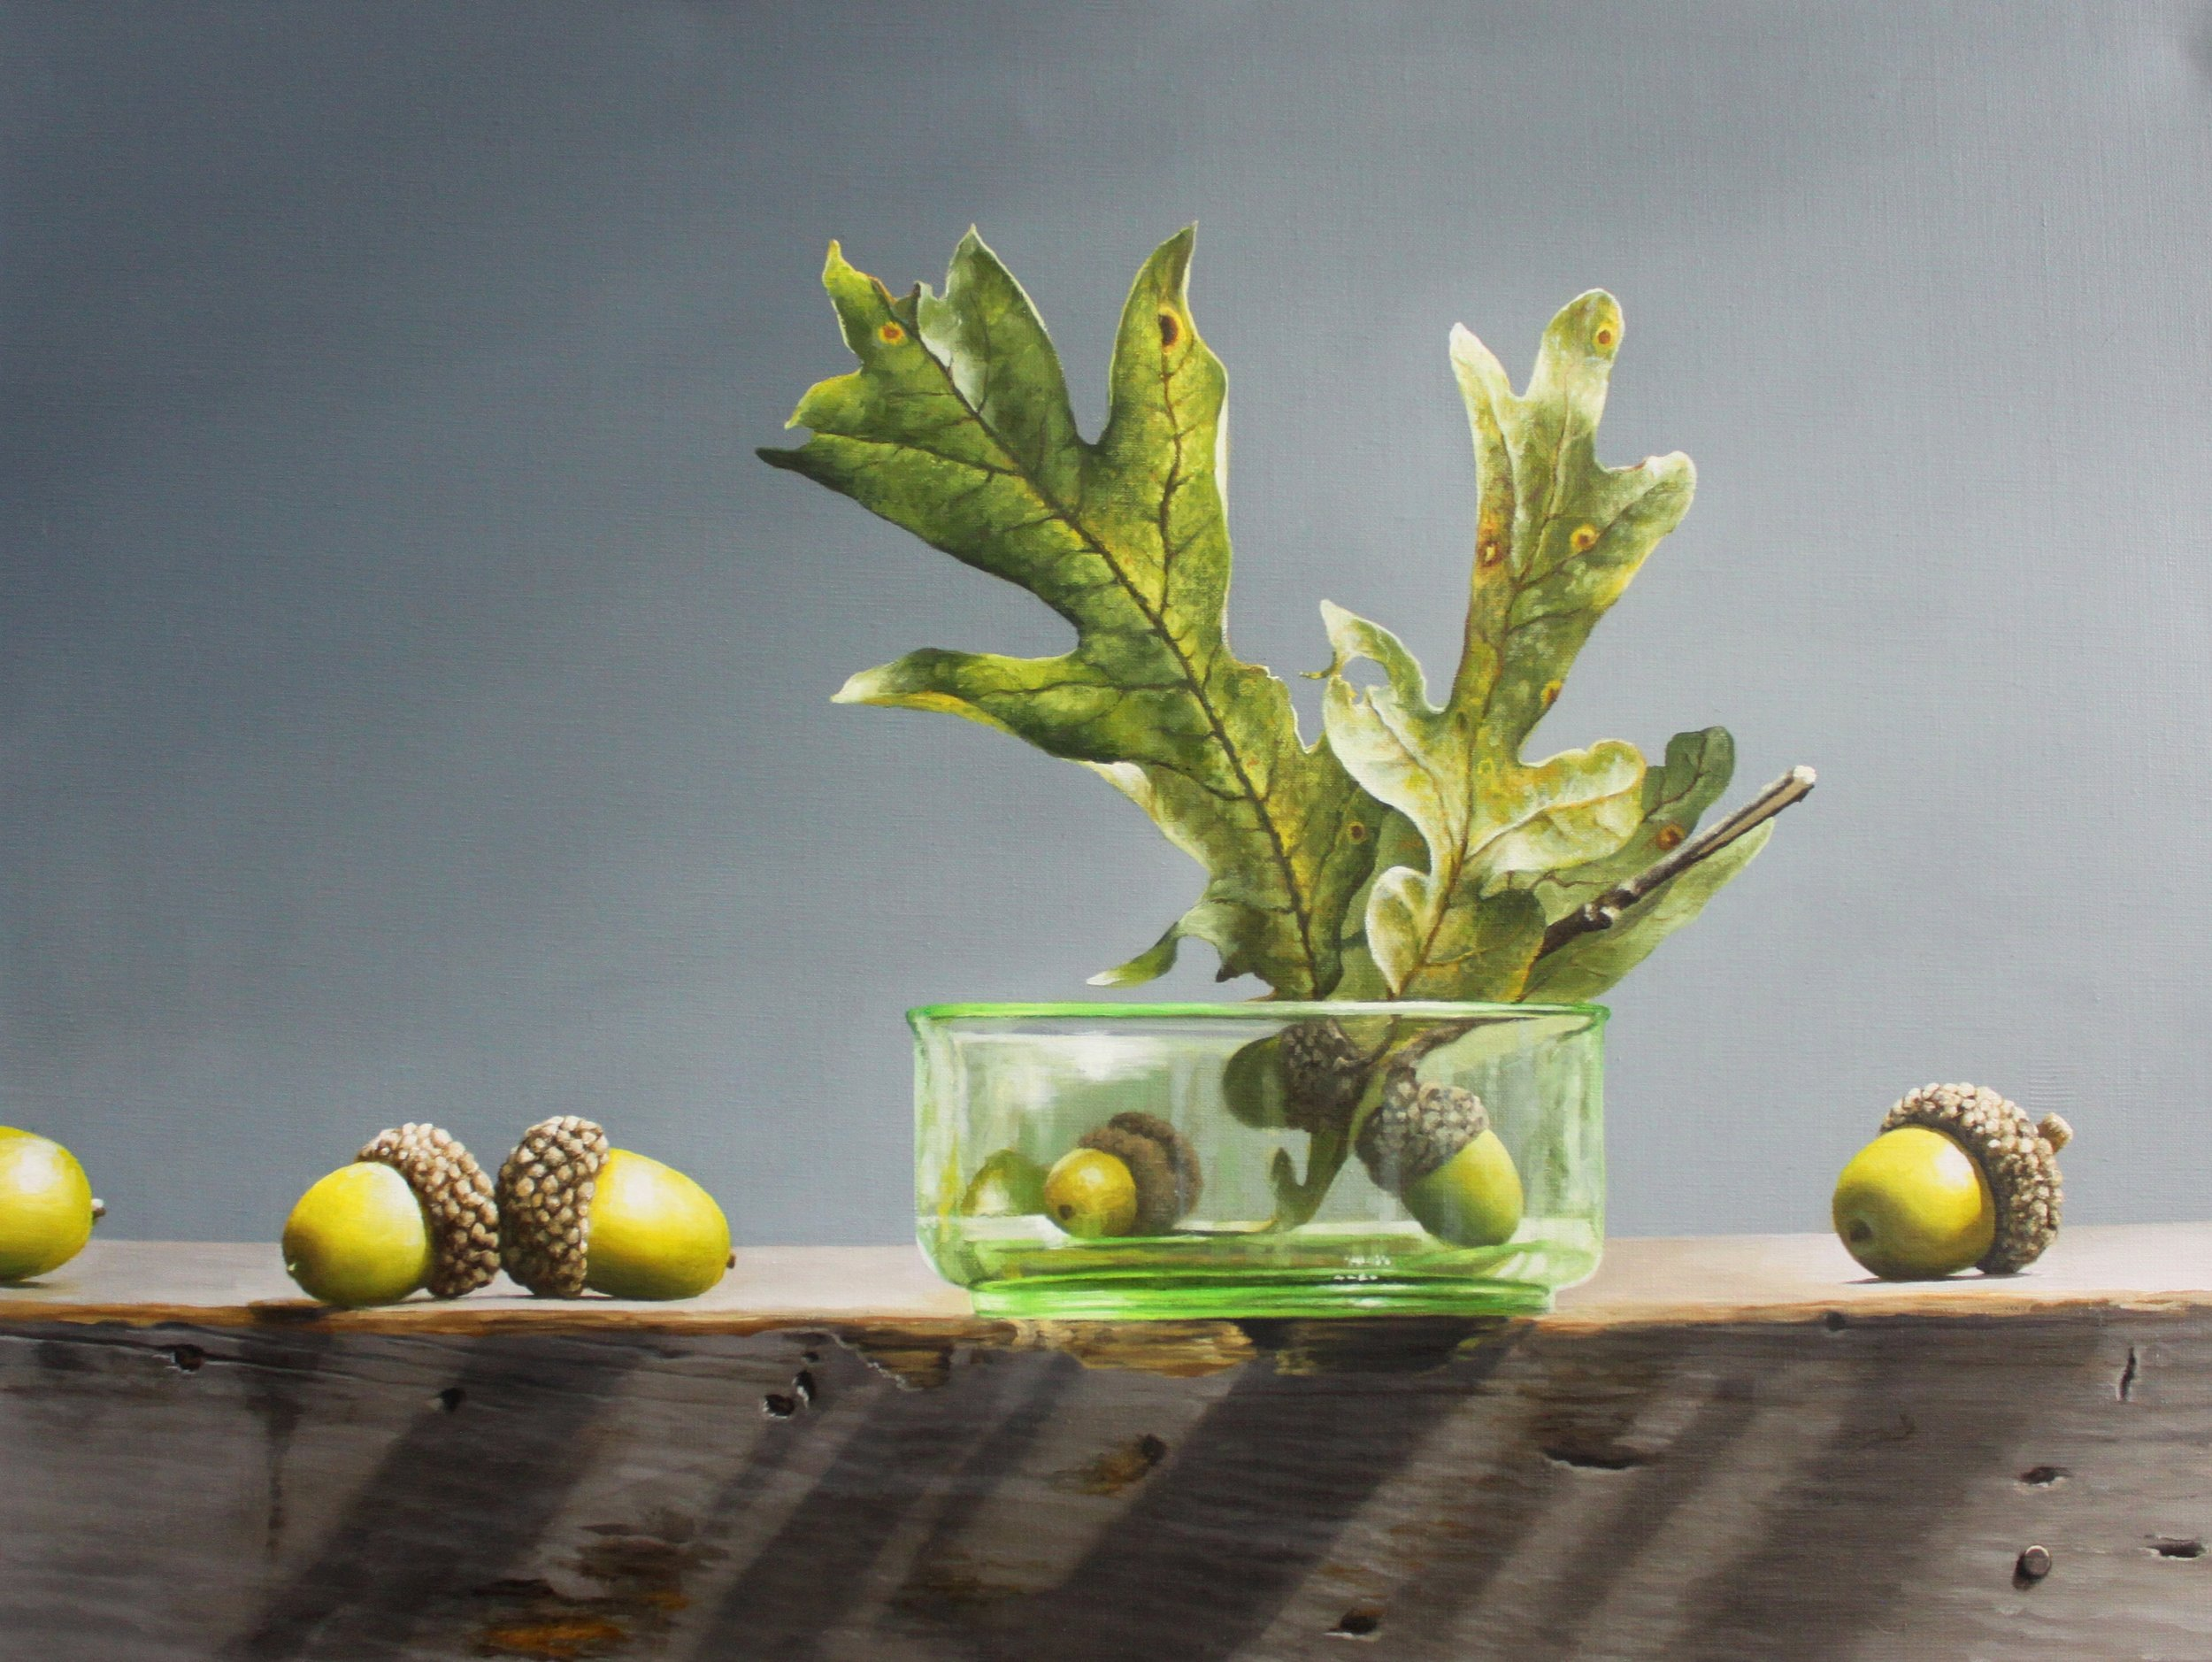 acorns in green bowl 18x24.JPG